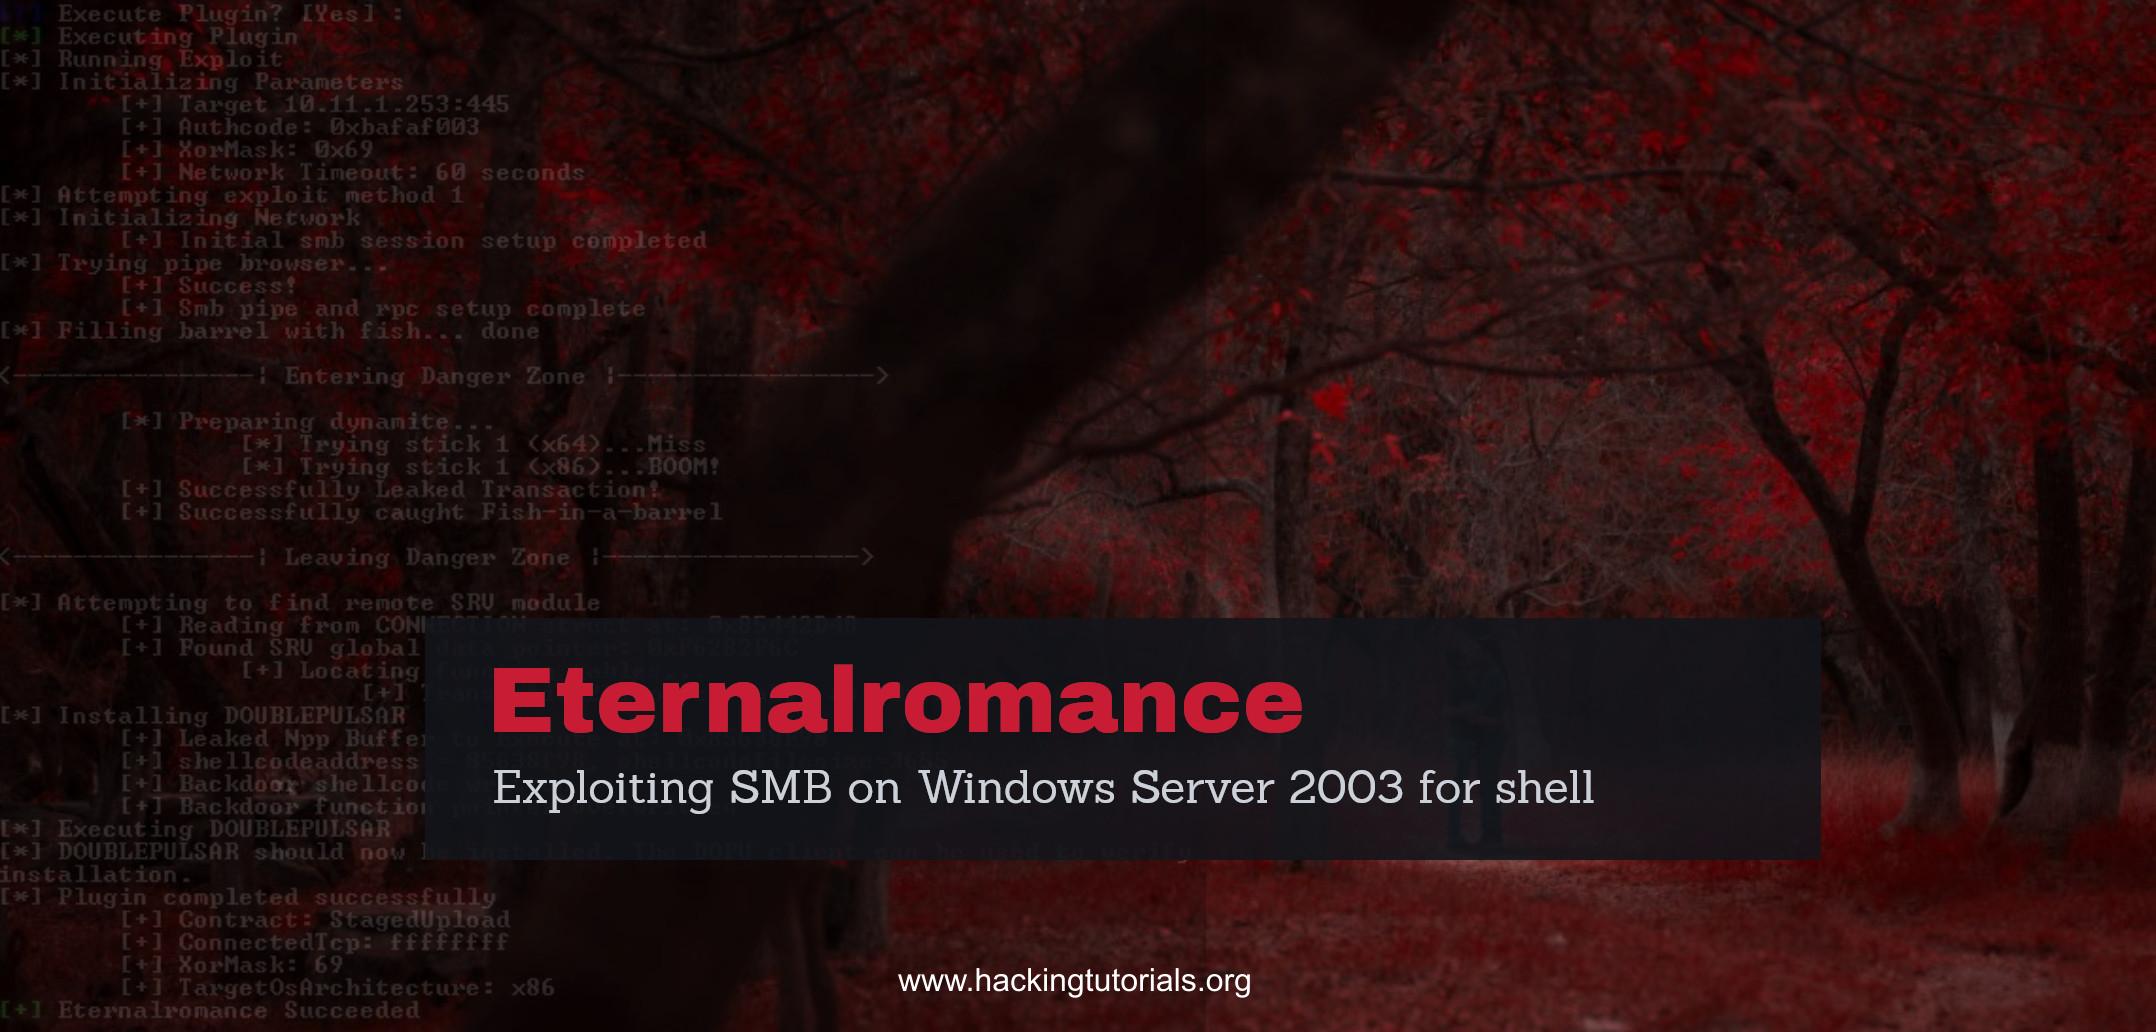 Windows command prompt nmap - Eternalromance Getting Shell On Windows 2003 Server